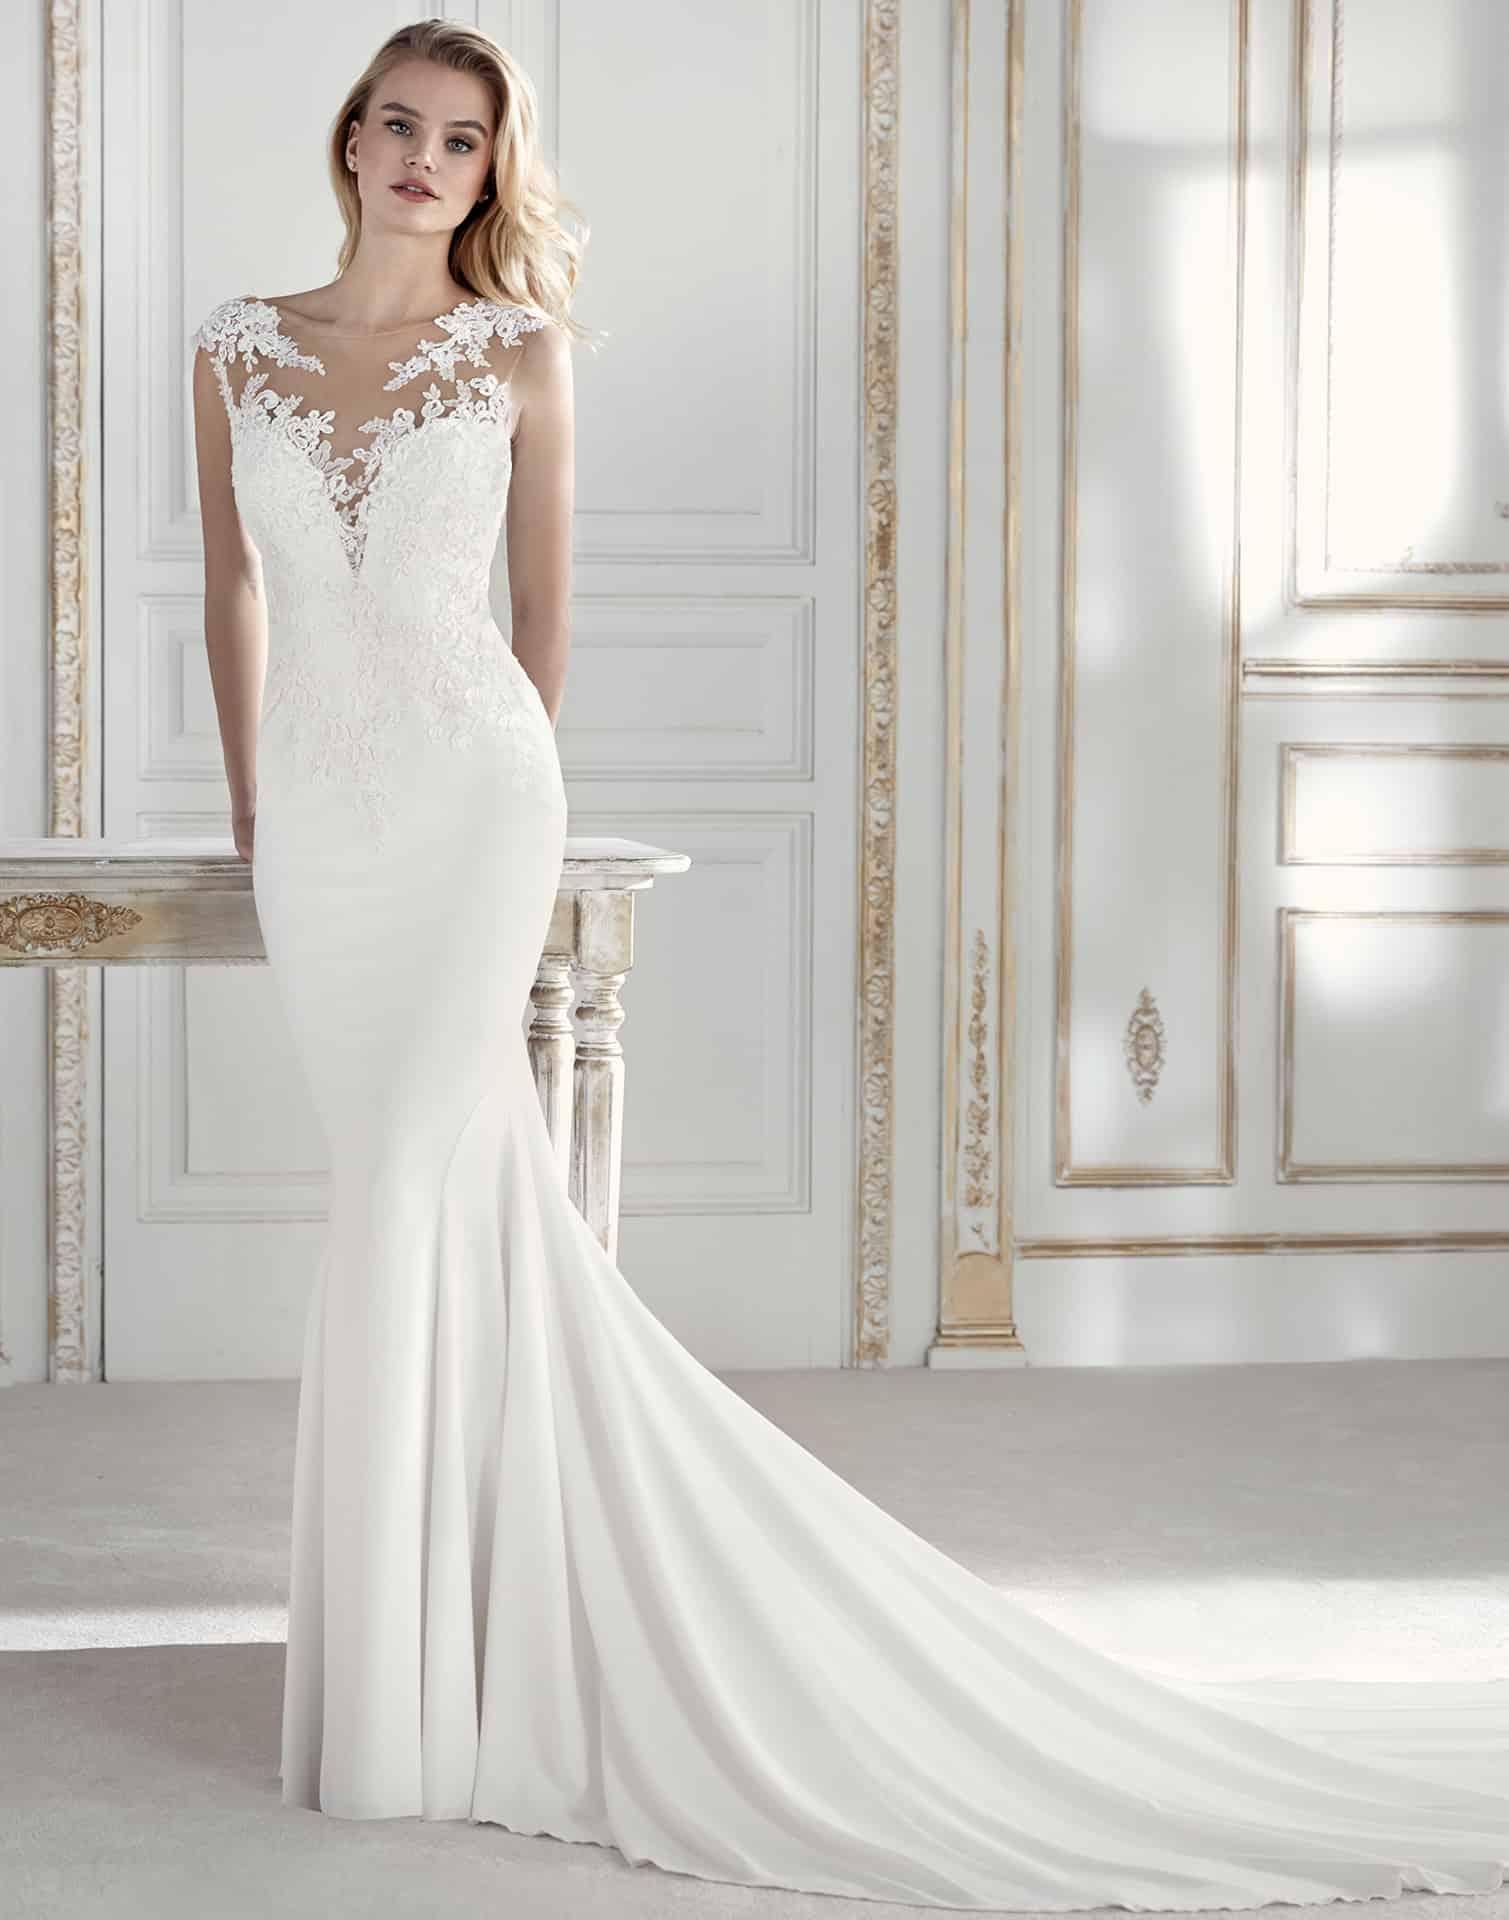 Wedding Dresses Gallery 42